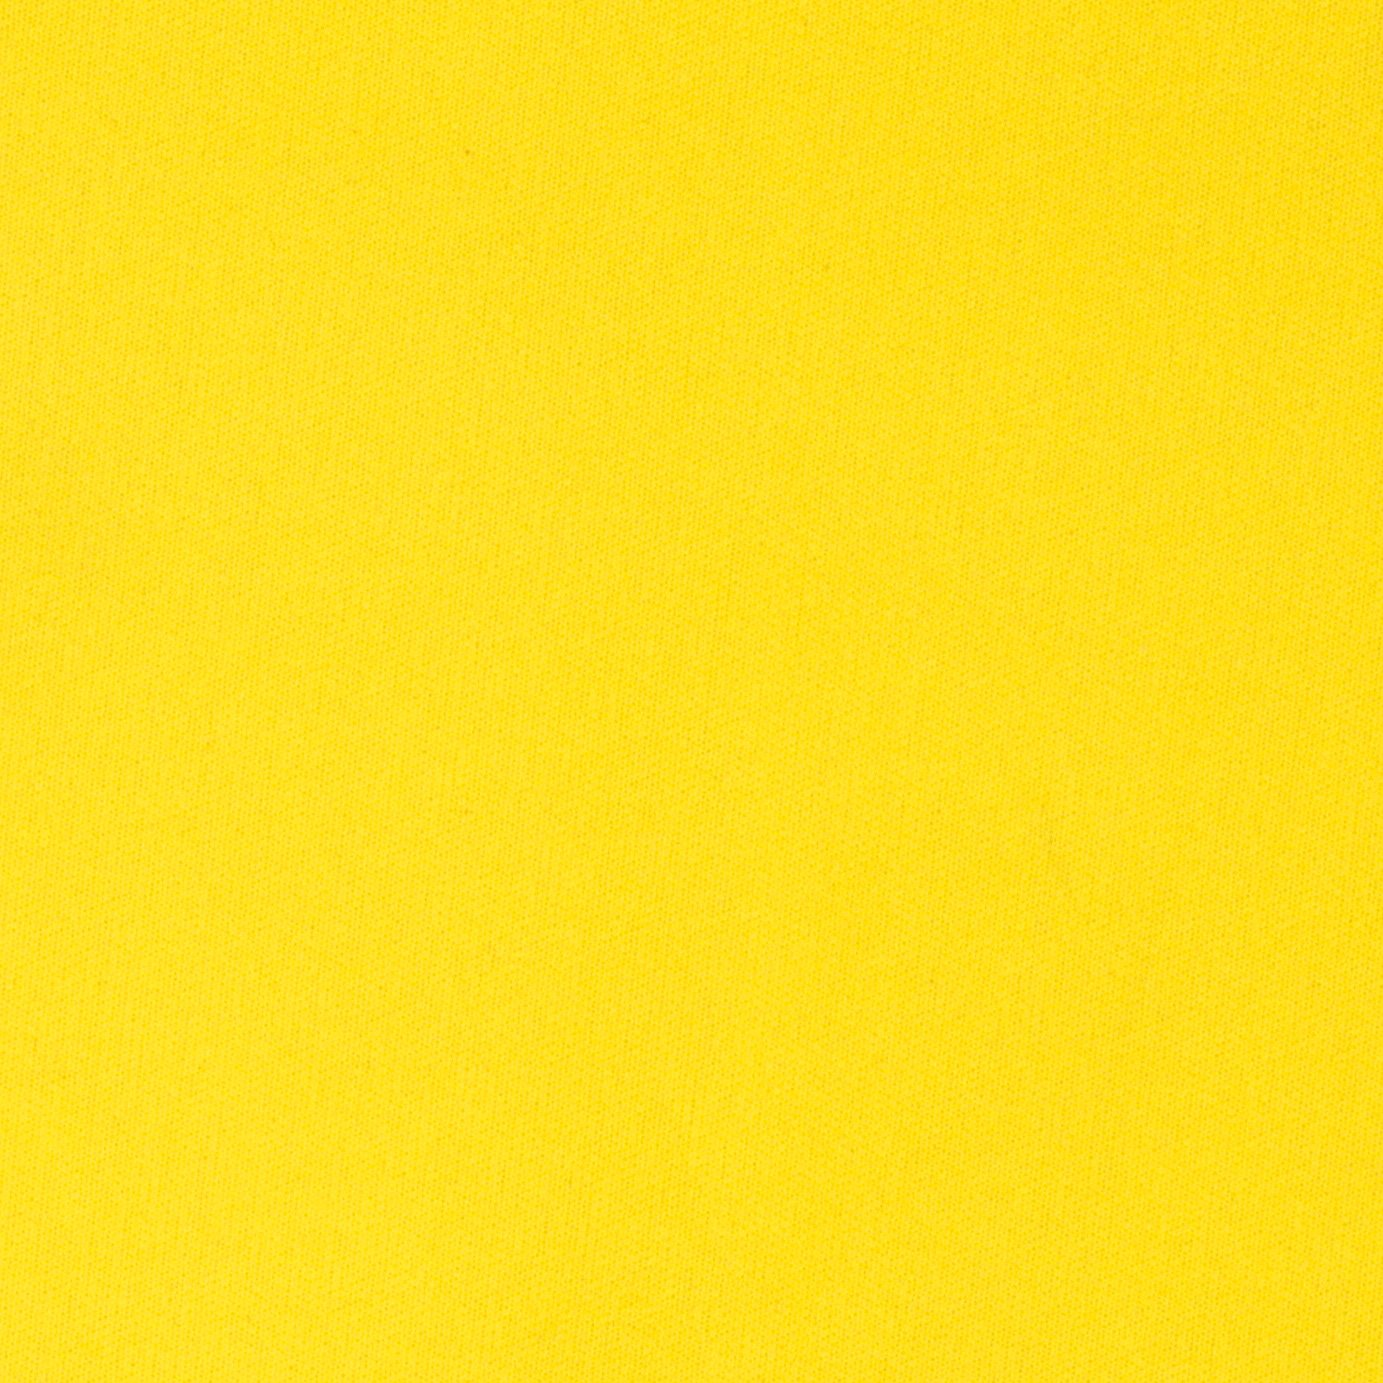 AKAS Tex PUL (Polyurethane Laminate) 1Mil, Yard, Citron Yellow